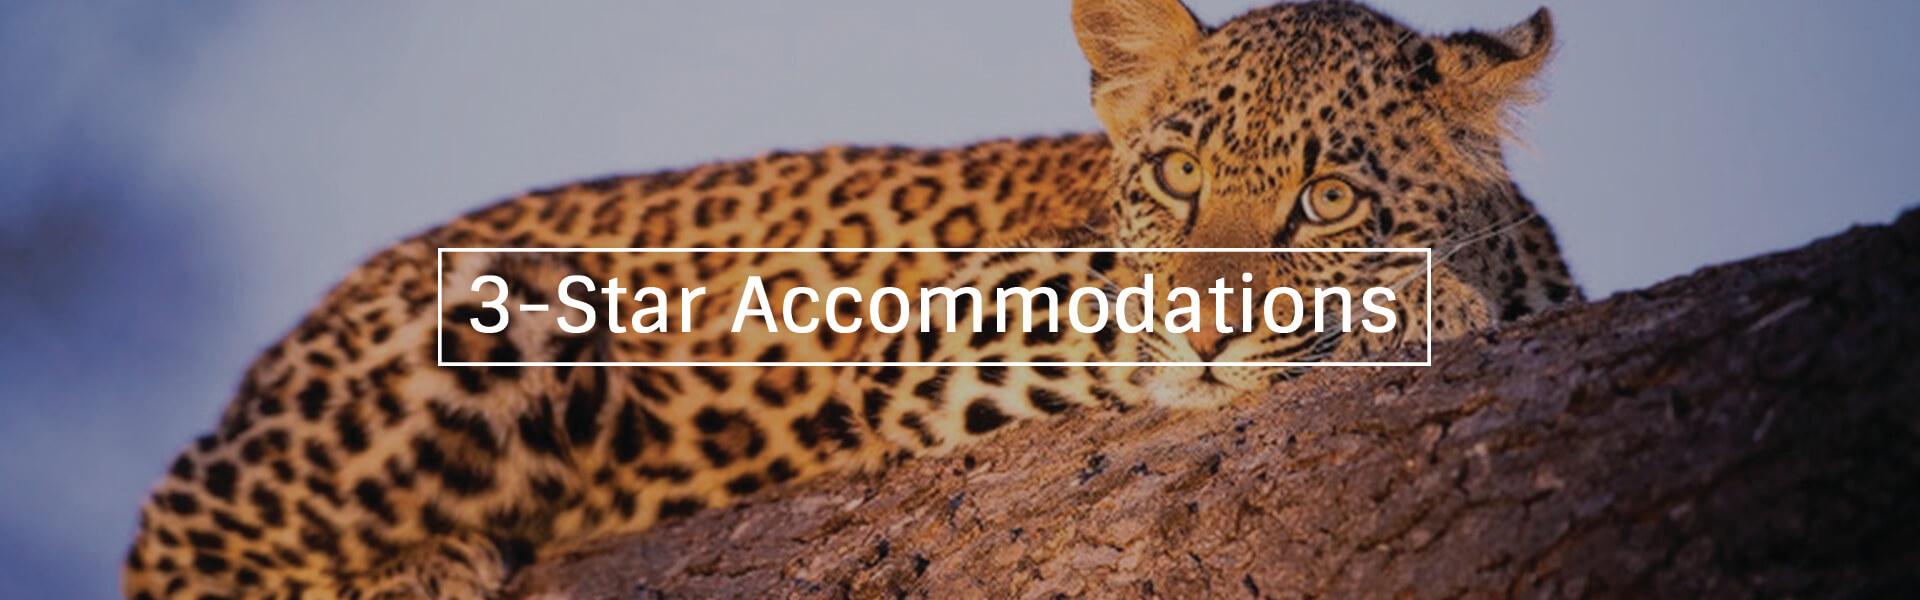 3 Star Accommodation Banner12